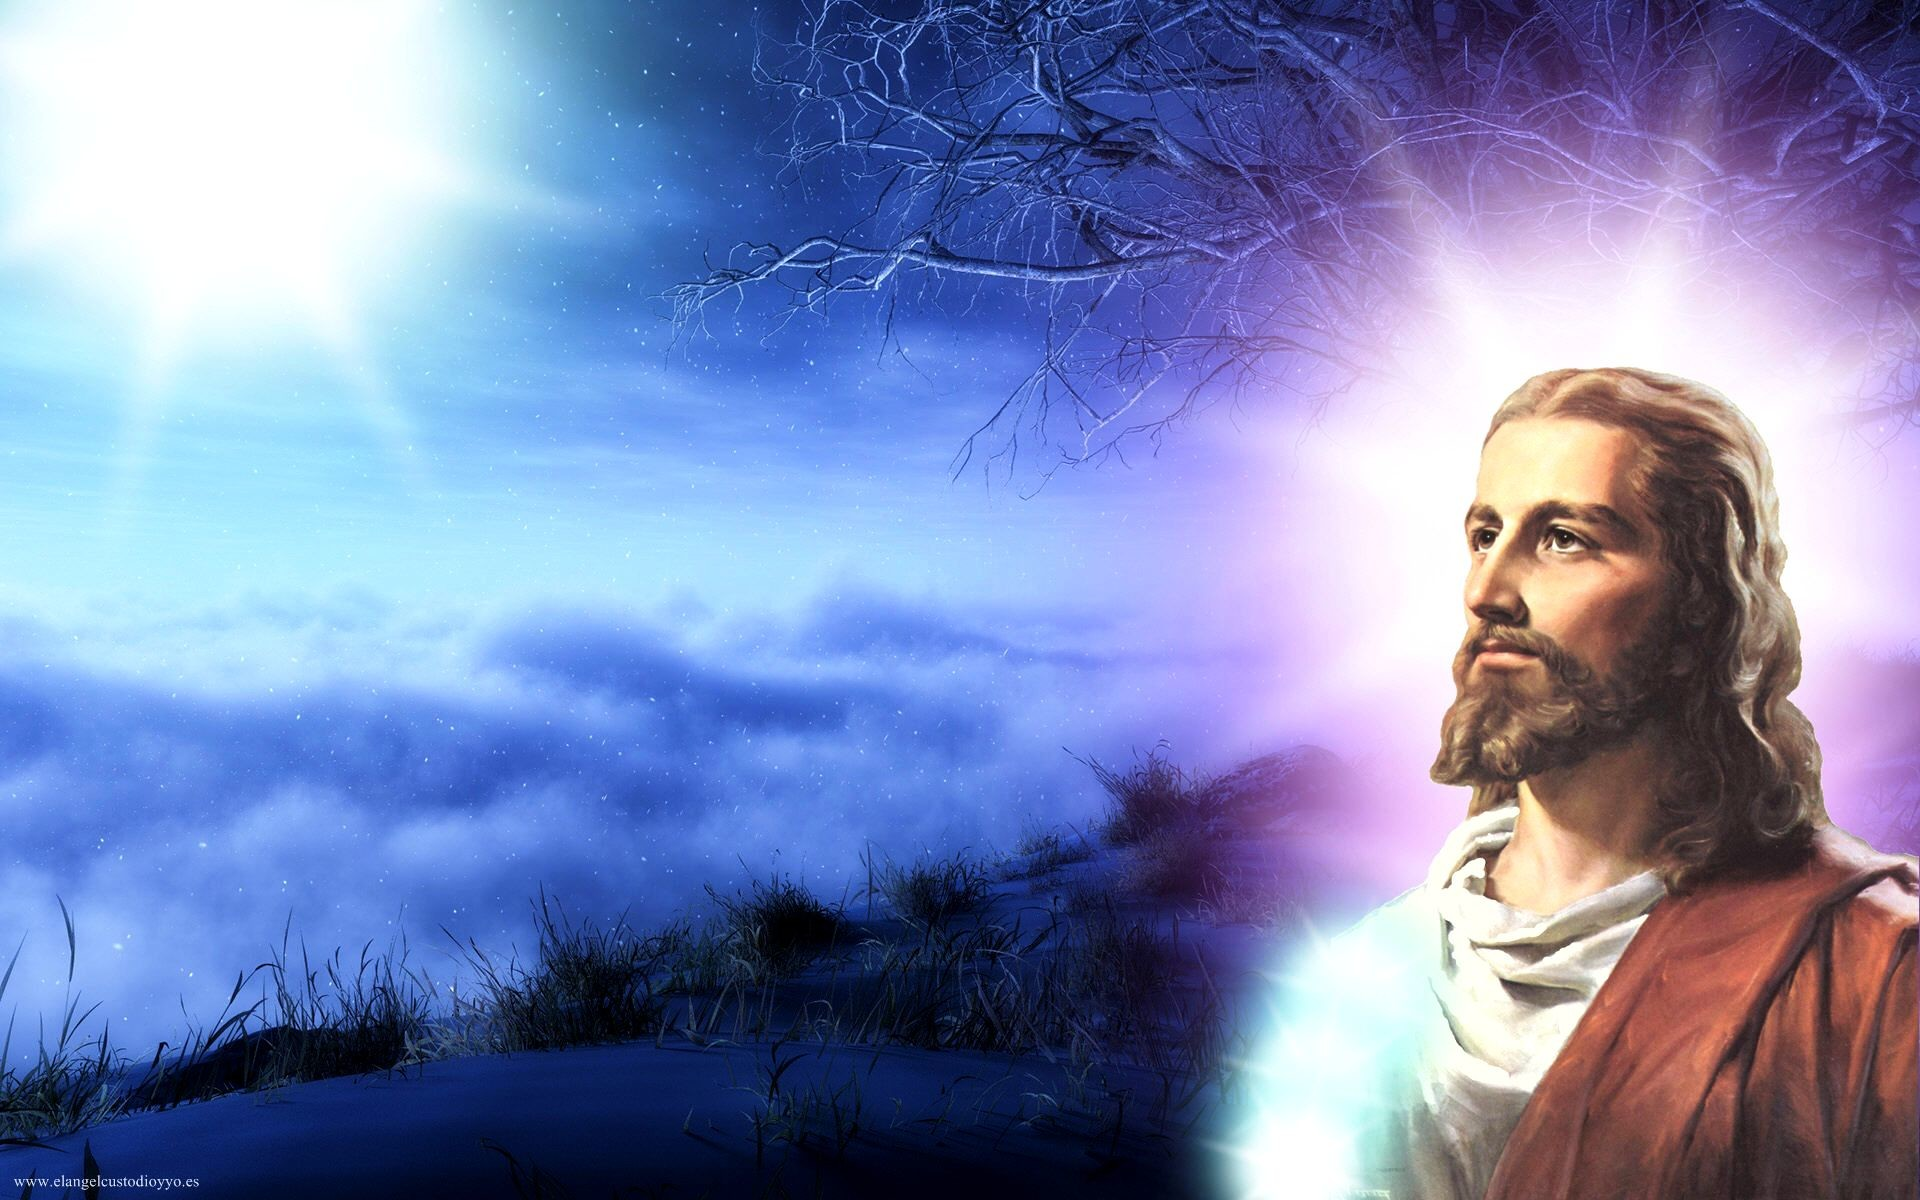 … Christian Christmas Desktop Wallpaper Jesus Christ Celebrating Christmas  With Christian Christmas Desktop Wallpaper …